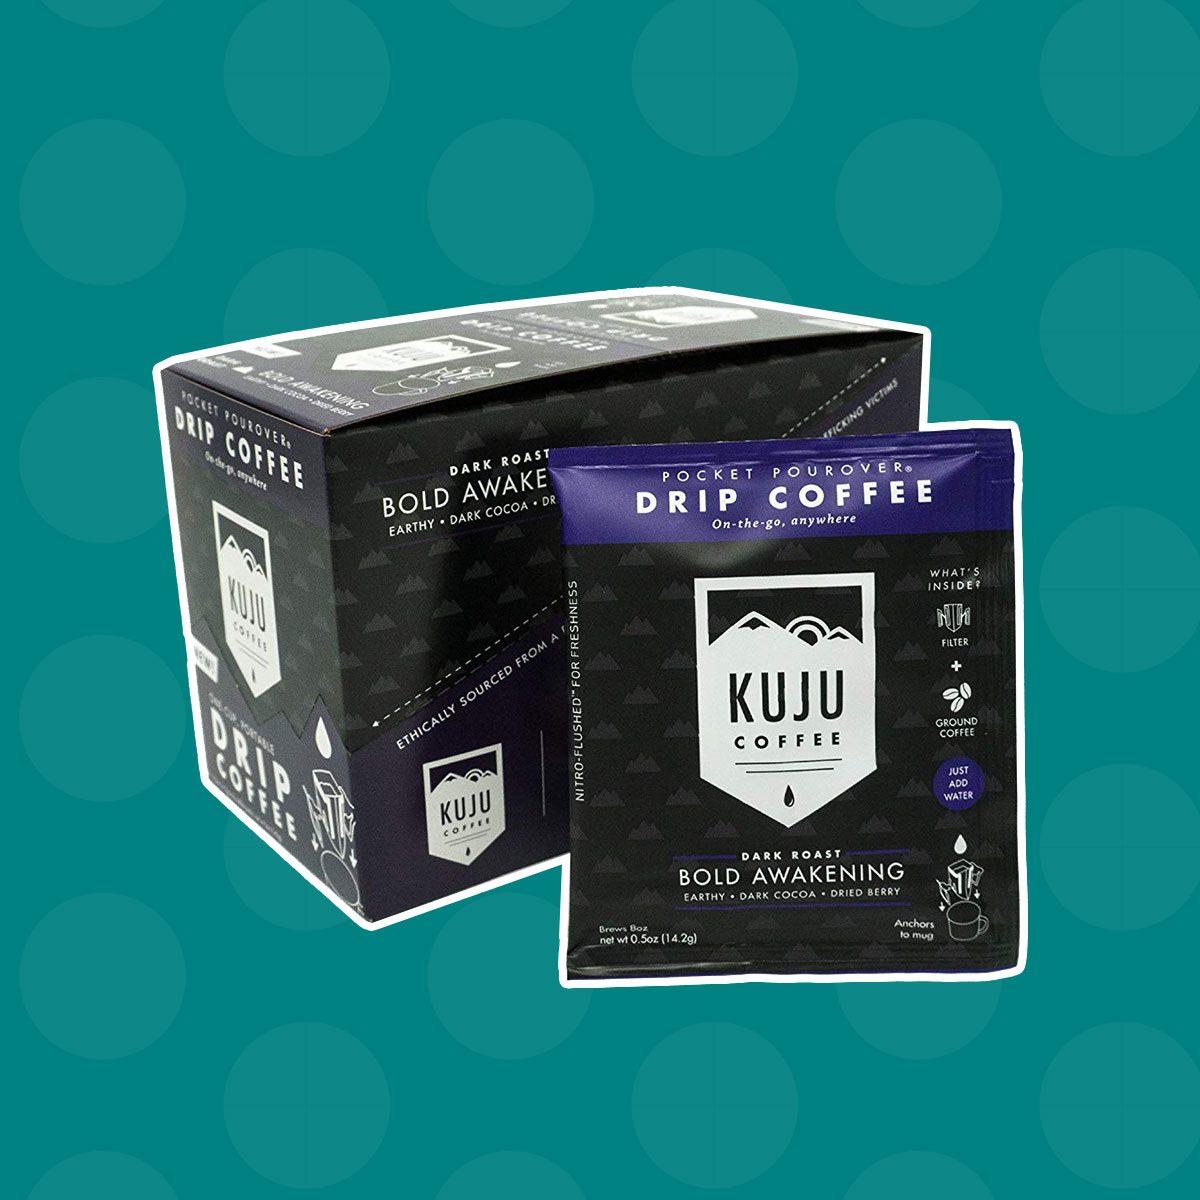 Kuju Coffee Pocket PourOver